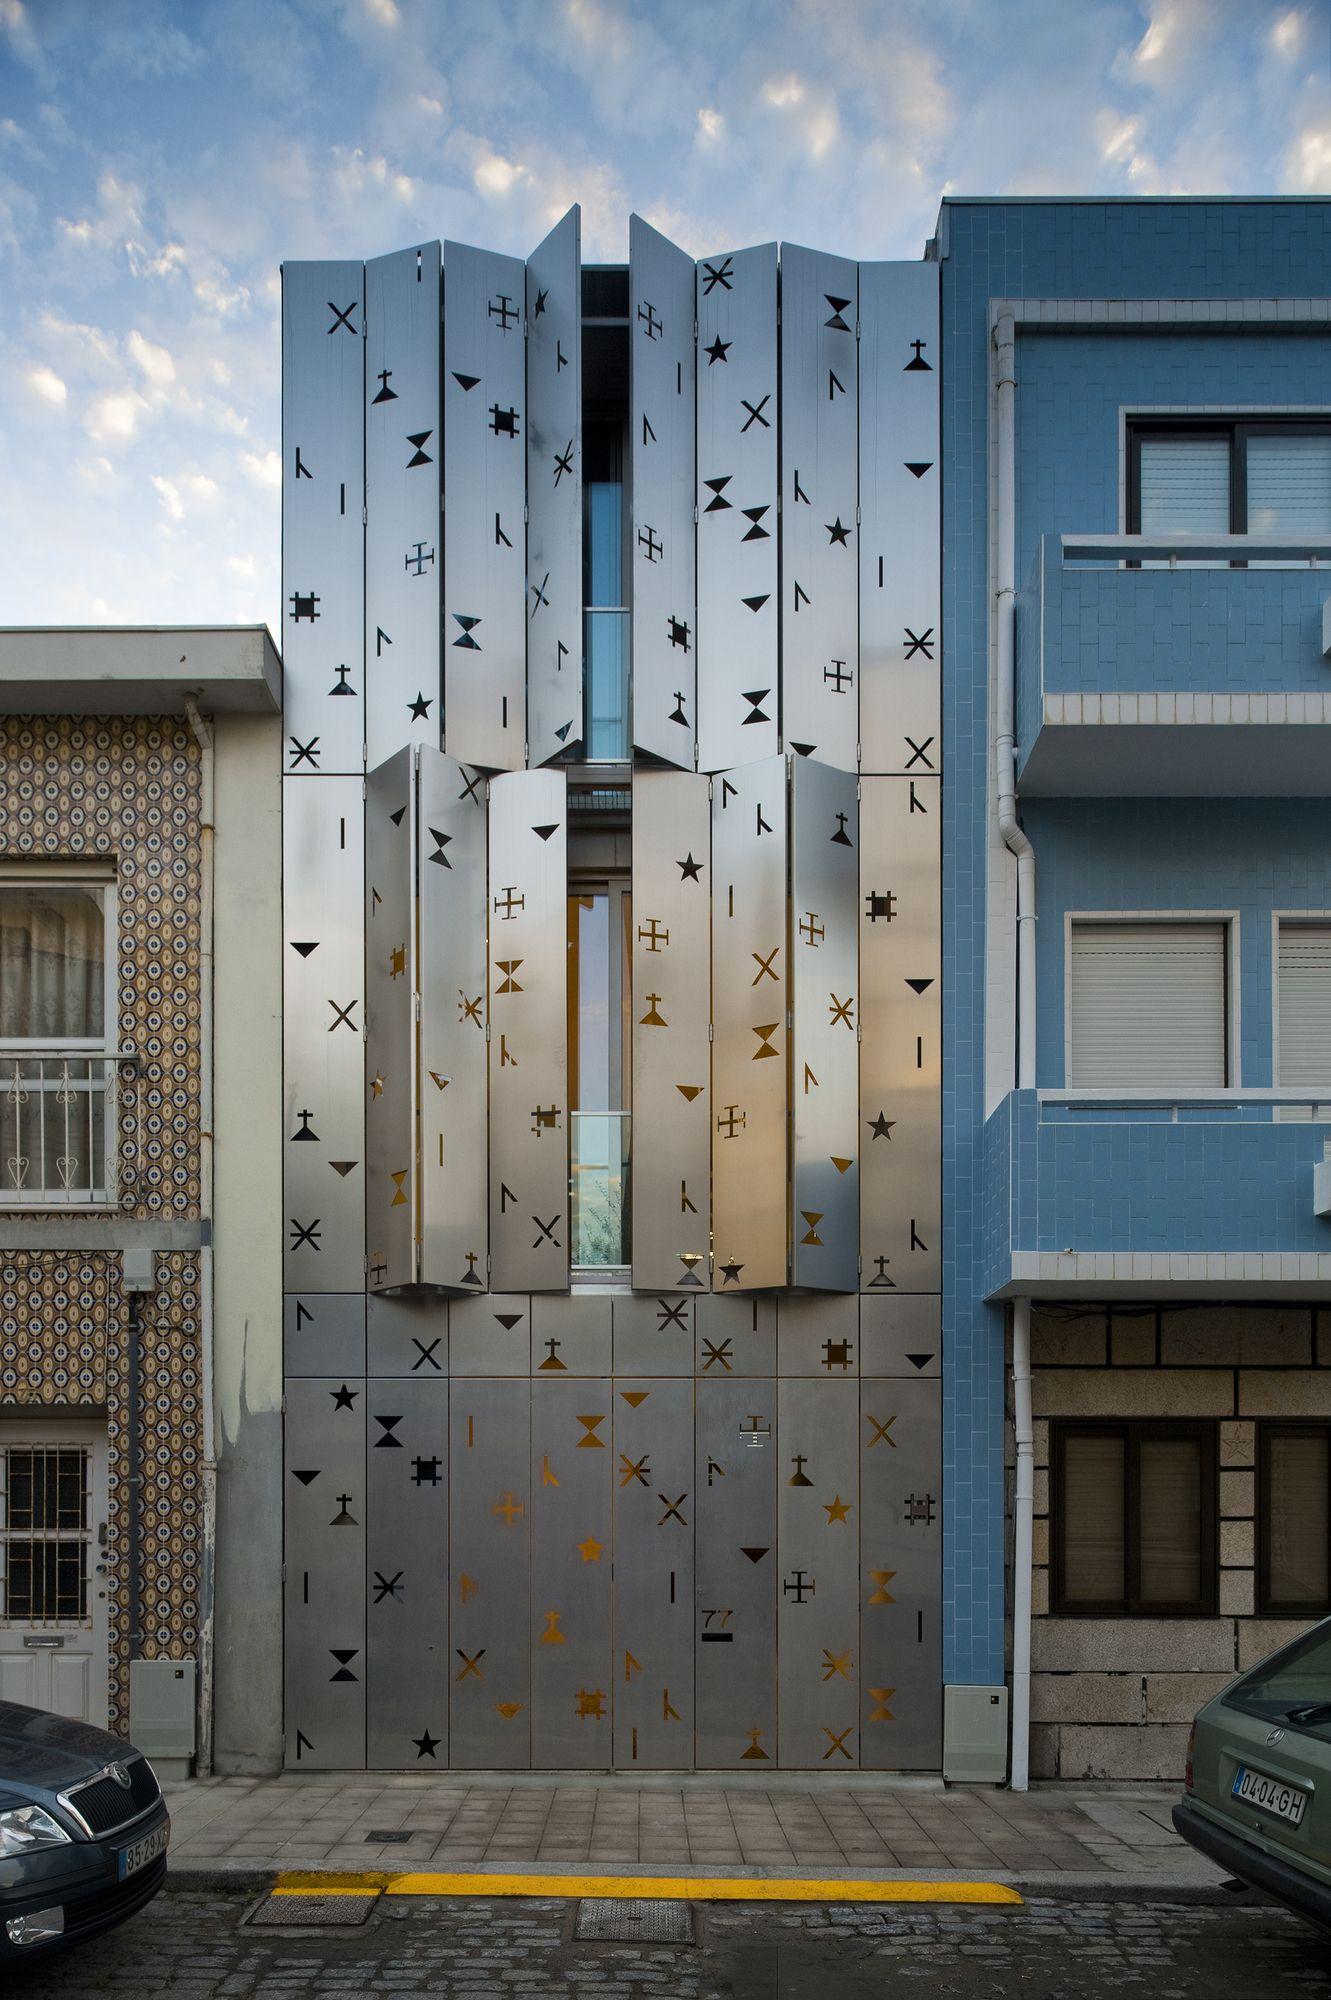 Best Kitchen Gallery: 35 Cool Building Facades Featuring Unconventional Design Strategies of Home Facade Designs  on rachelxblog.com